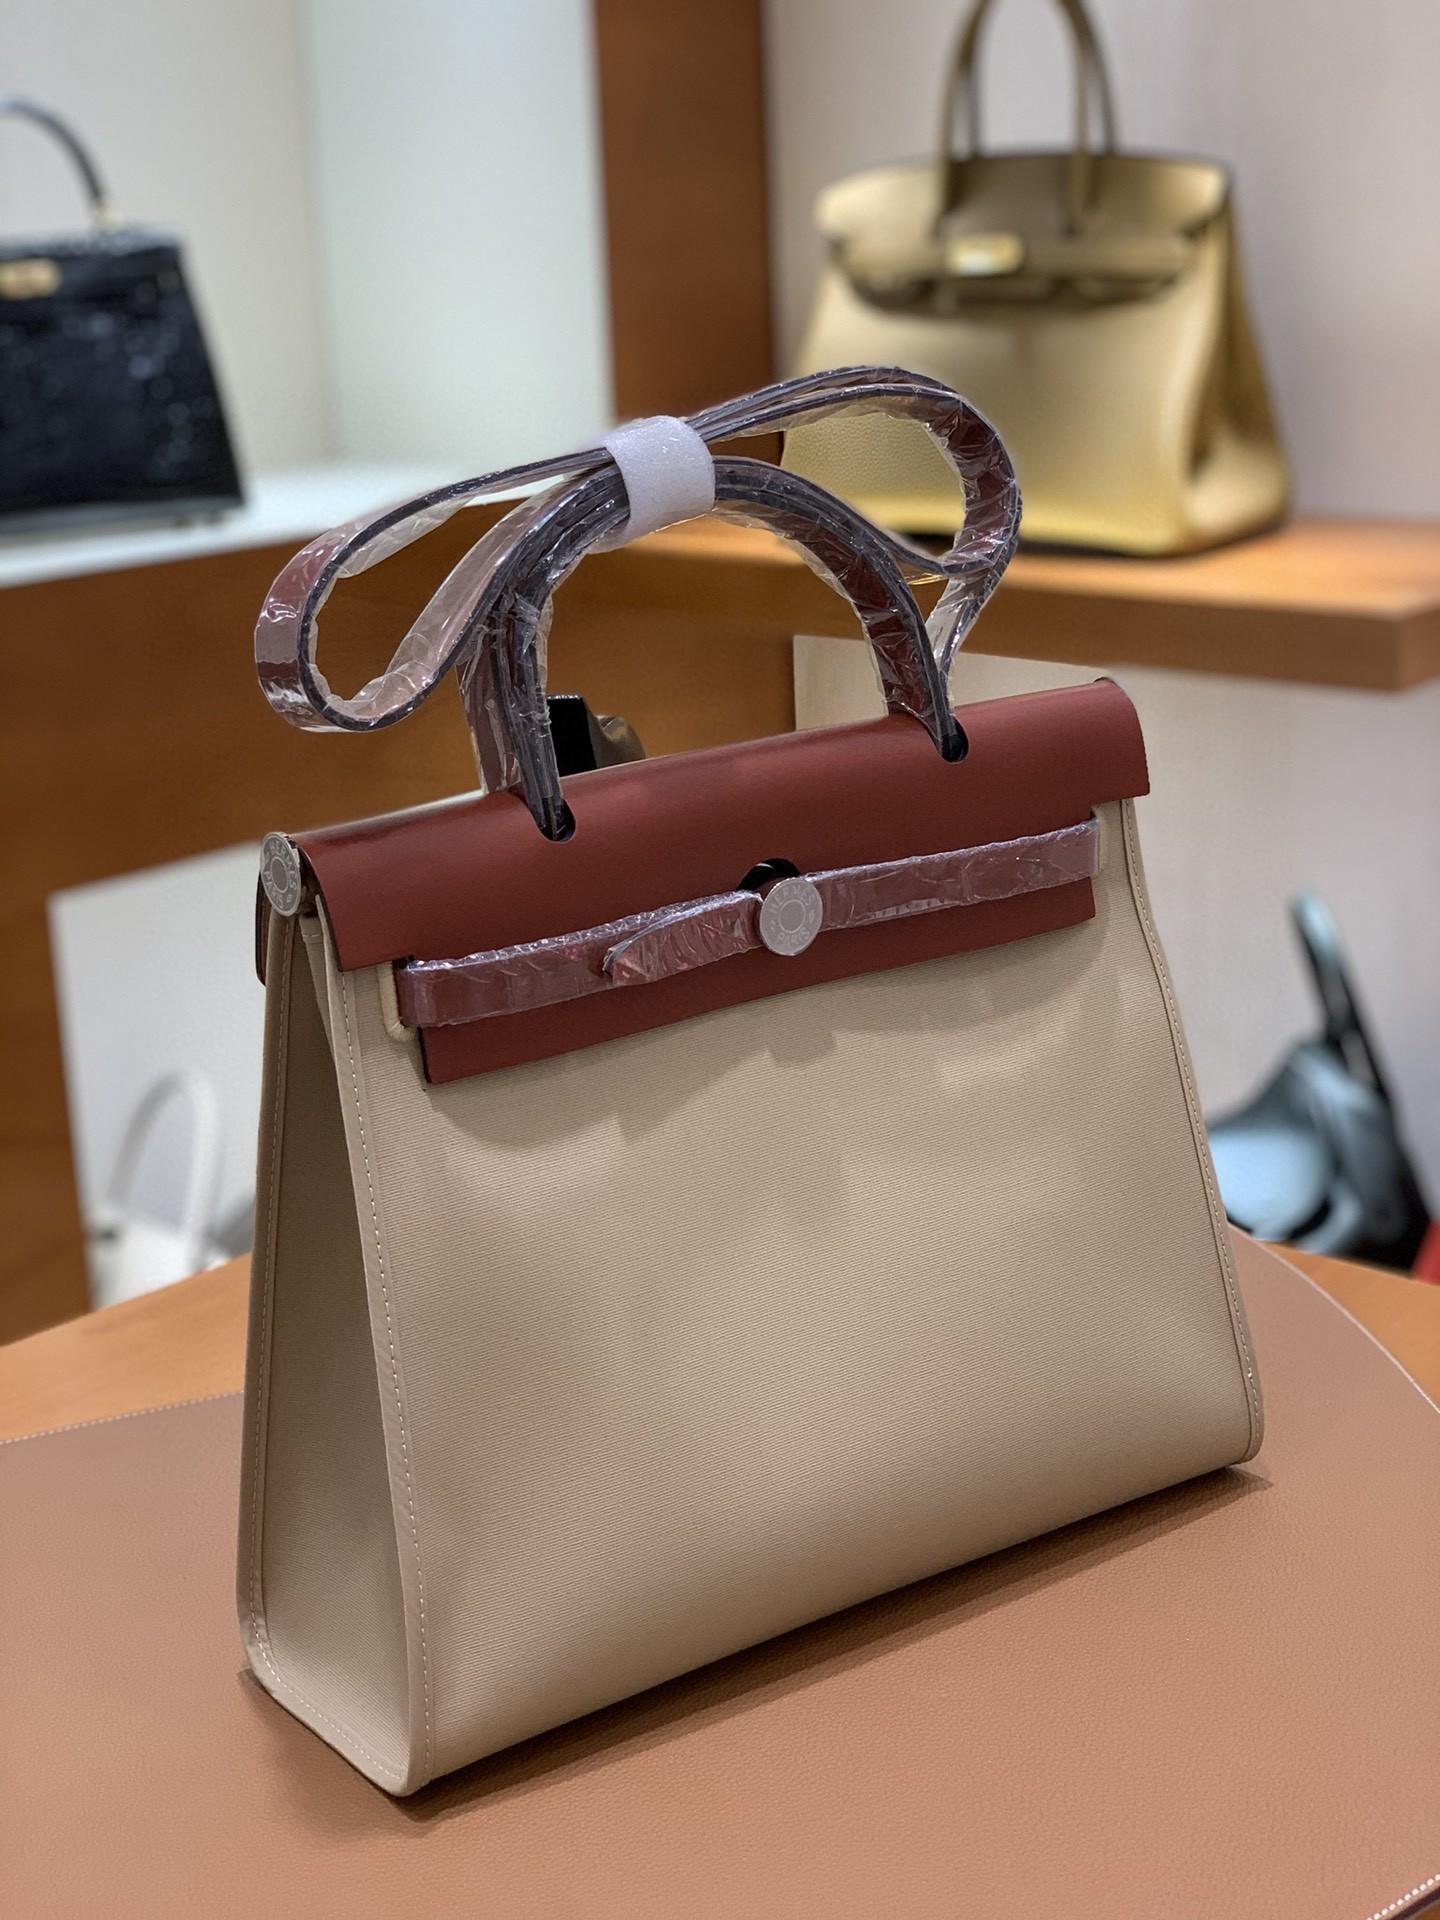 Hermès(爱马仕)Herbag 焦糖色拼风衣灰 Box帆布 银扣 31cm